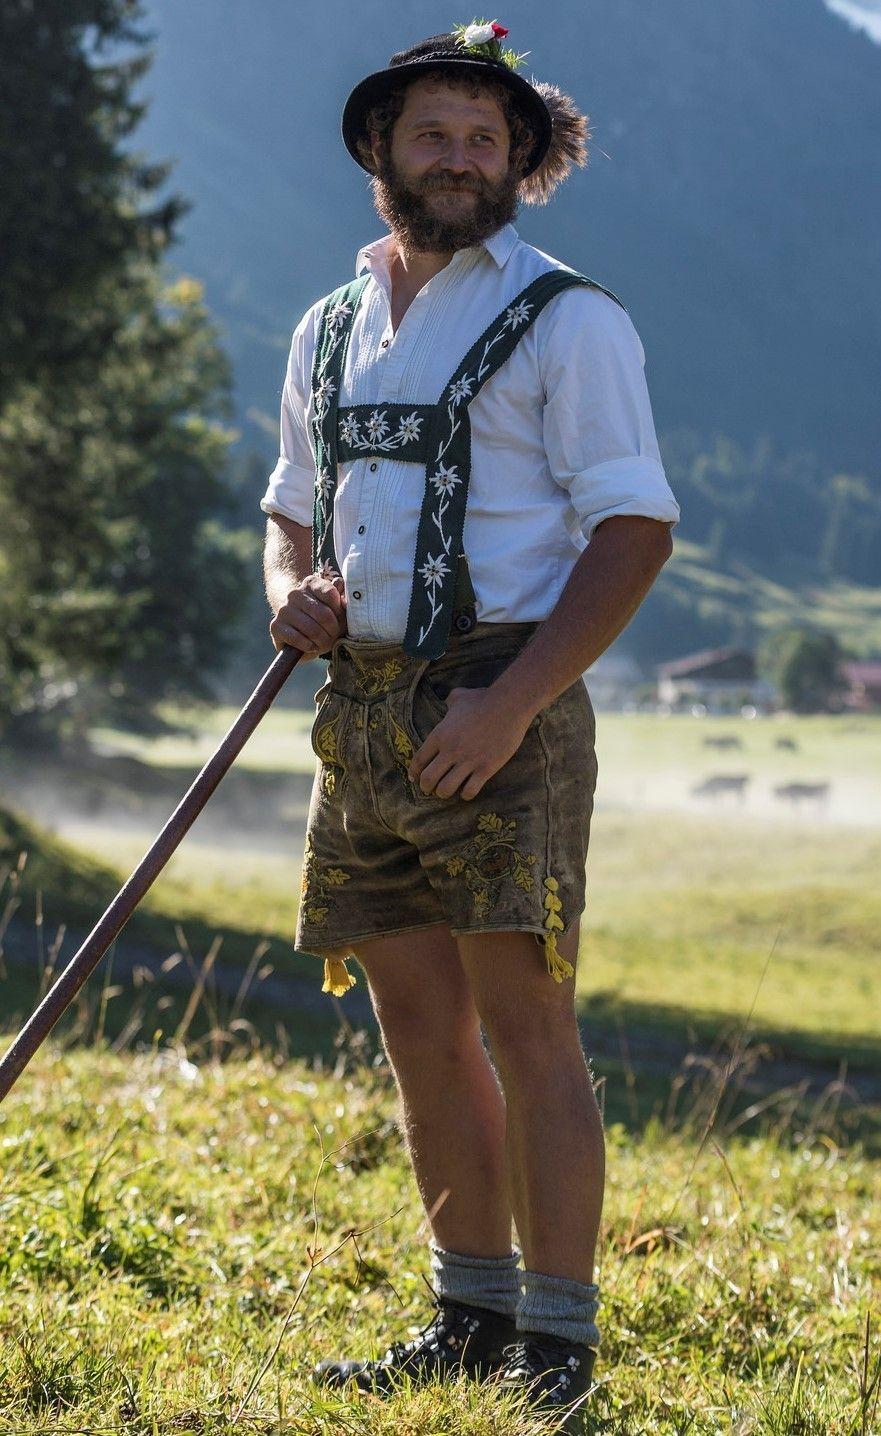 Classic lederhosen and suspenders   Lederhose, Oktoberfest